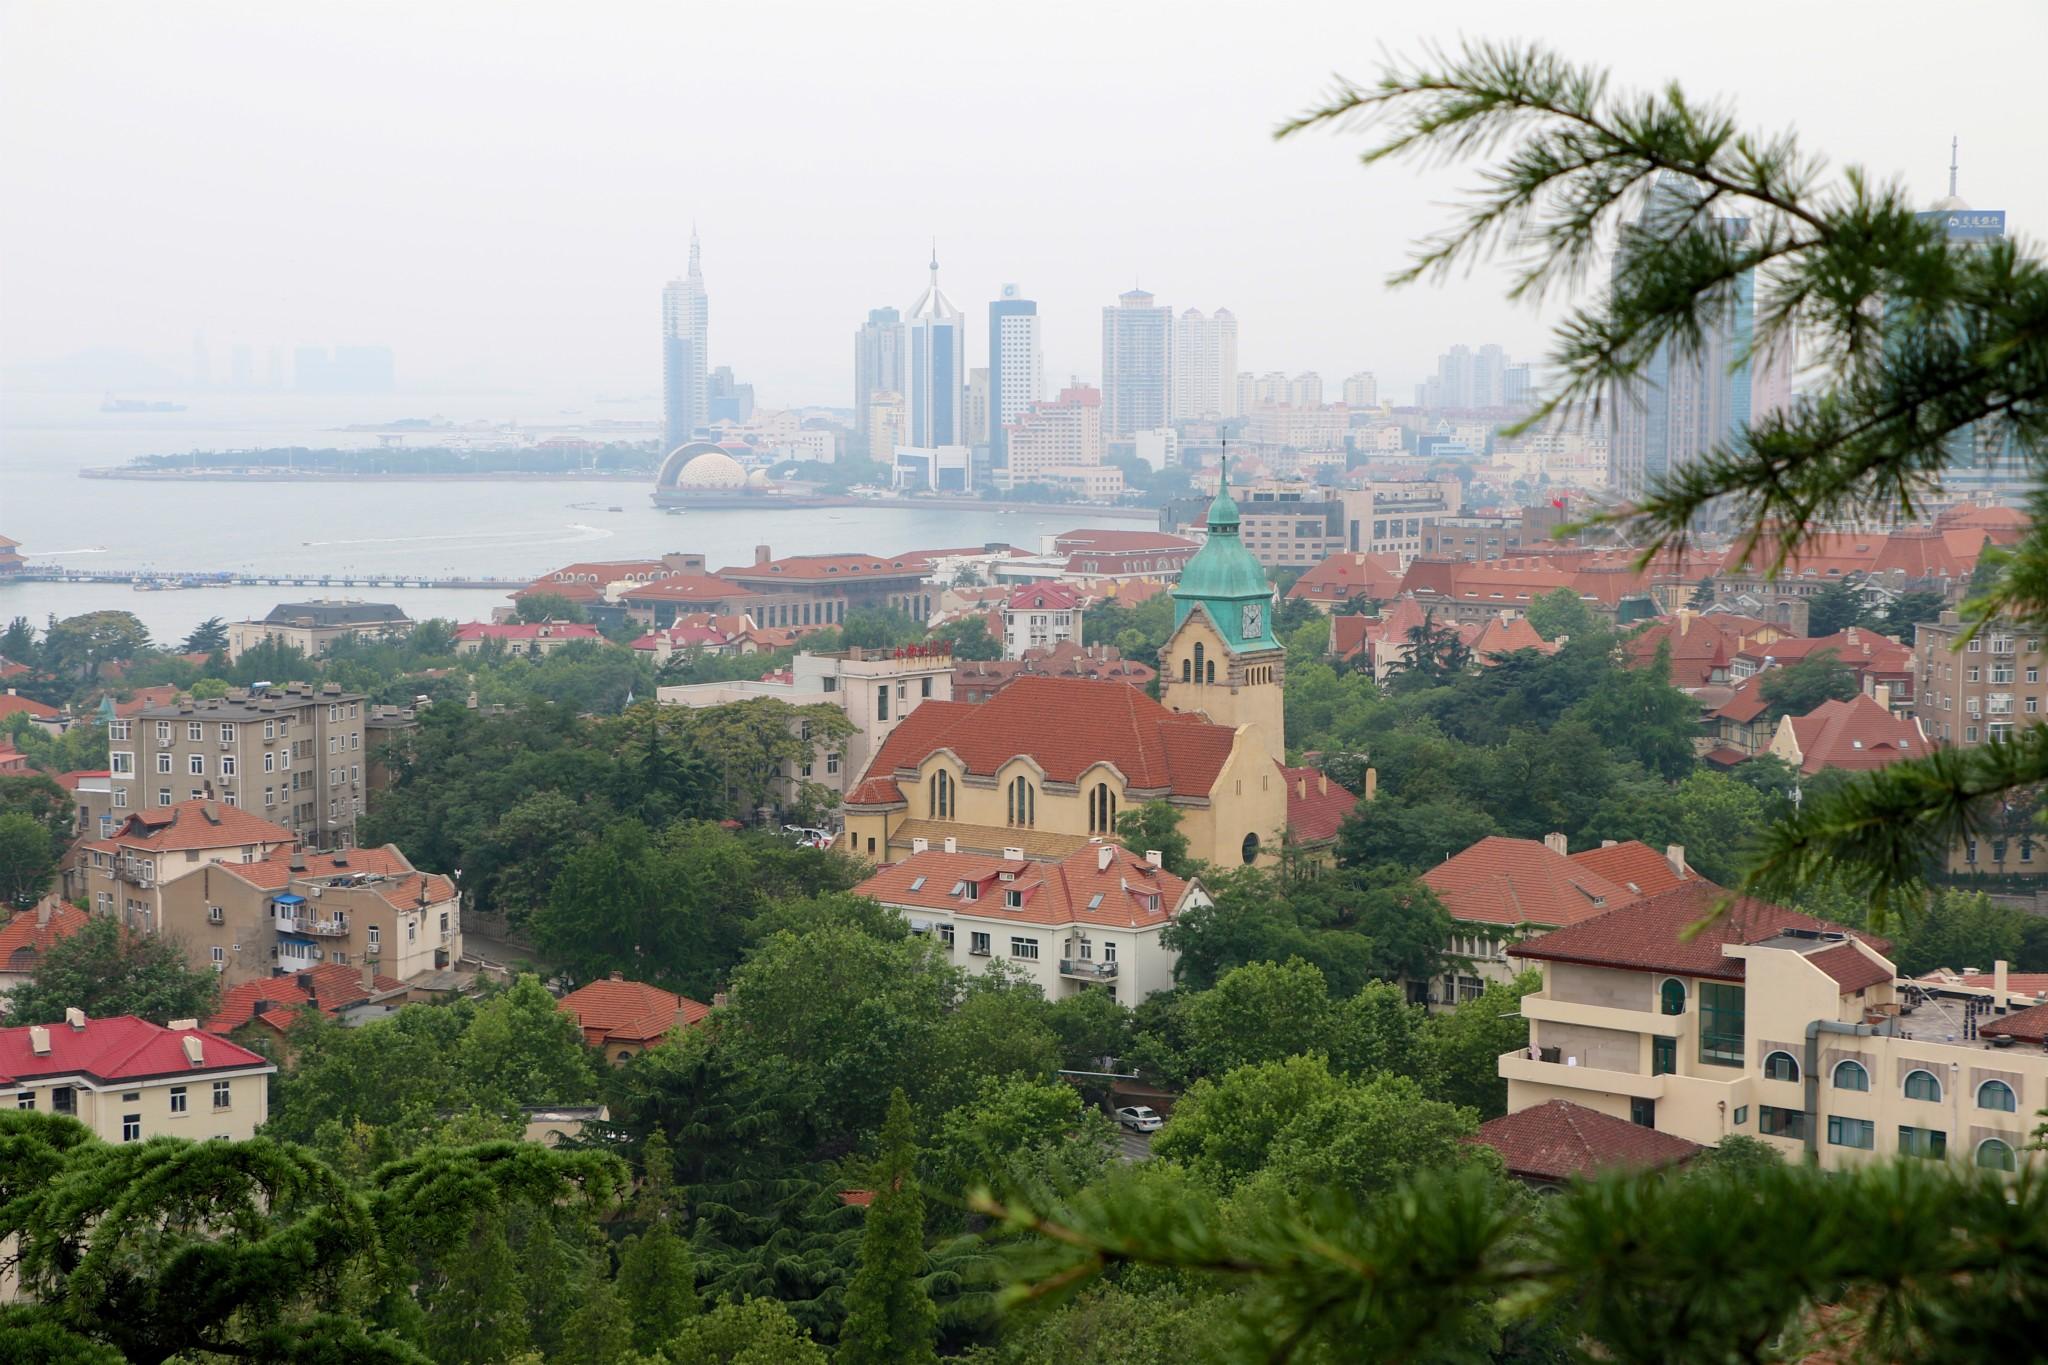 XinHaoShan Park│Signal Hill Park